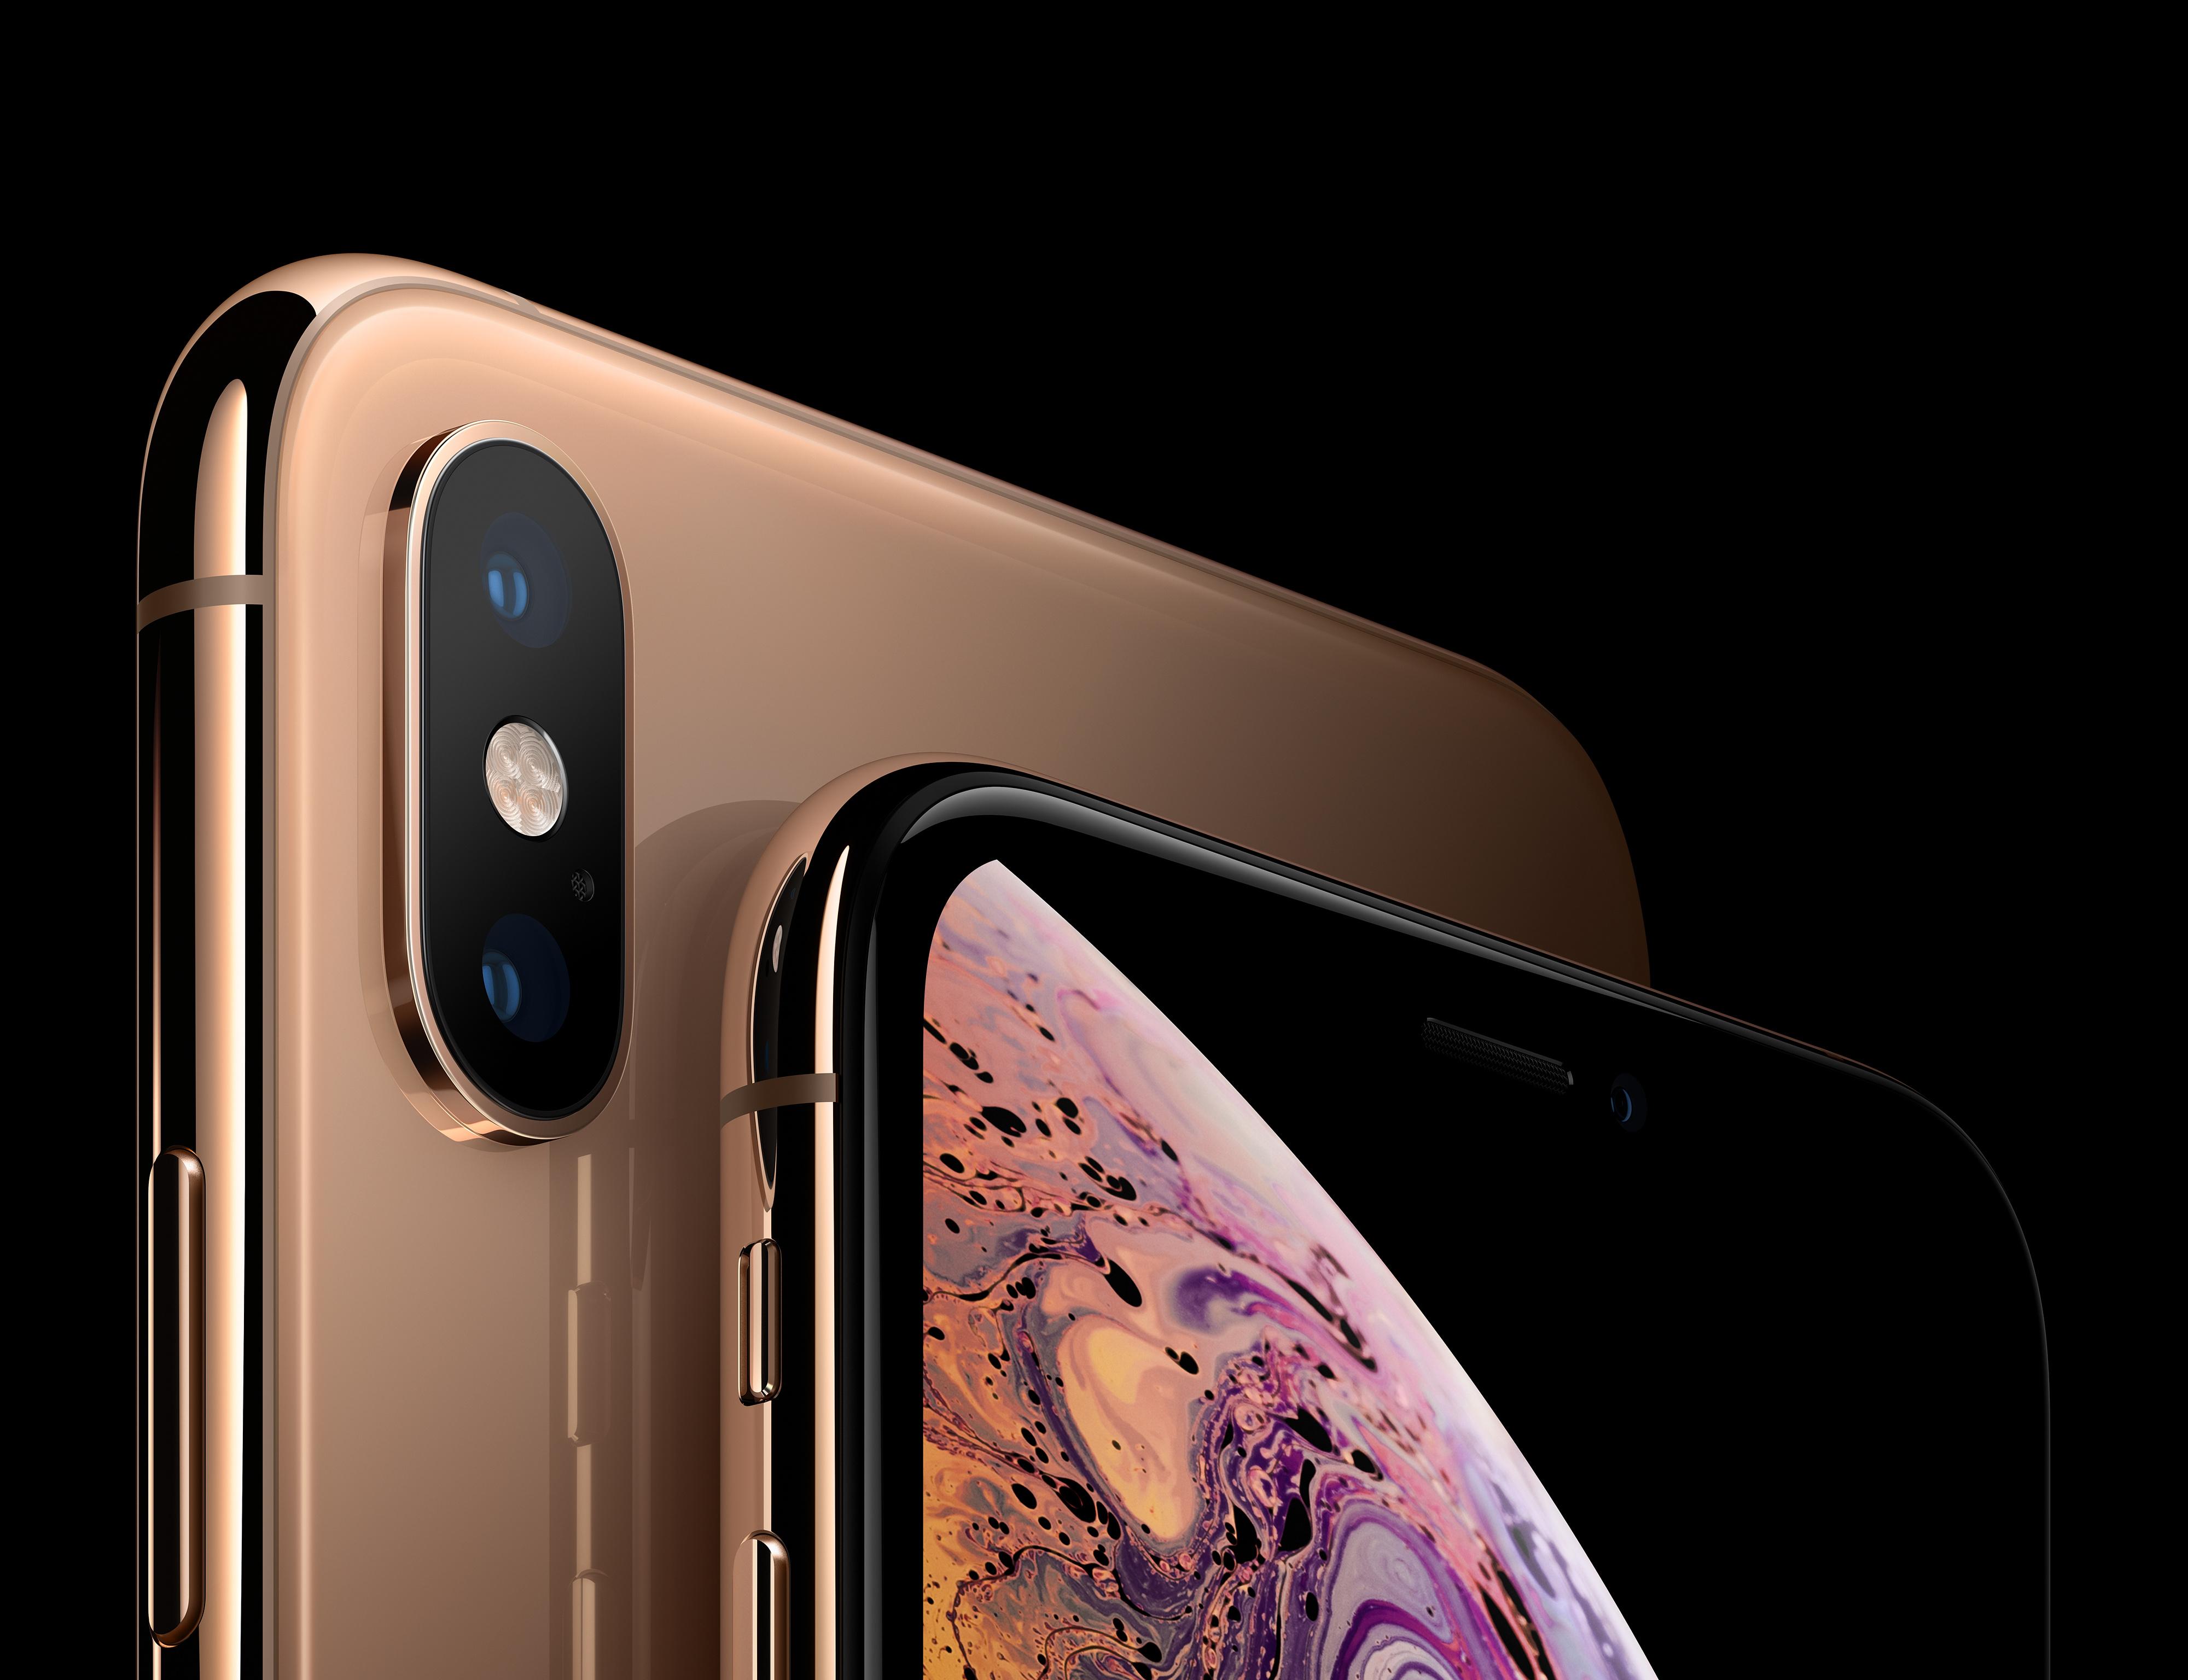 Apple - I nuovi iPhone 2019 con sensore Sony 3D